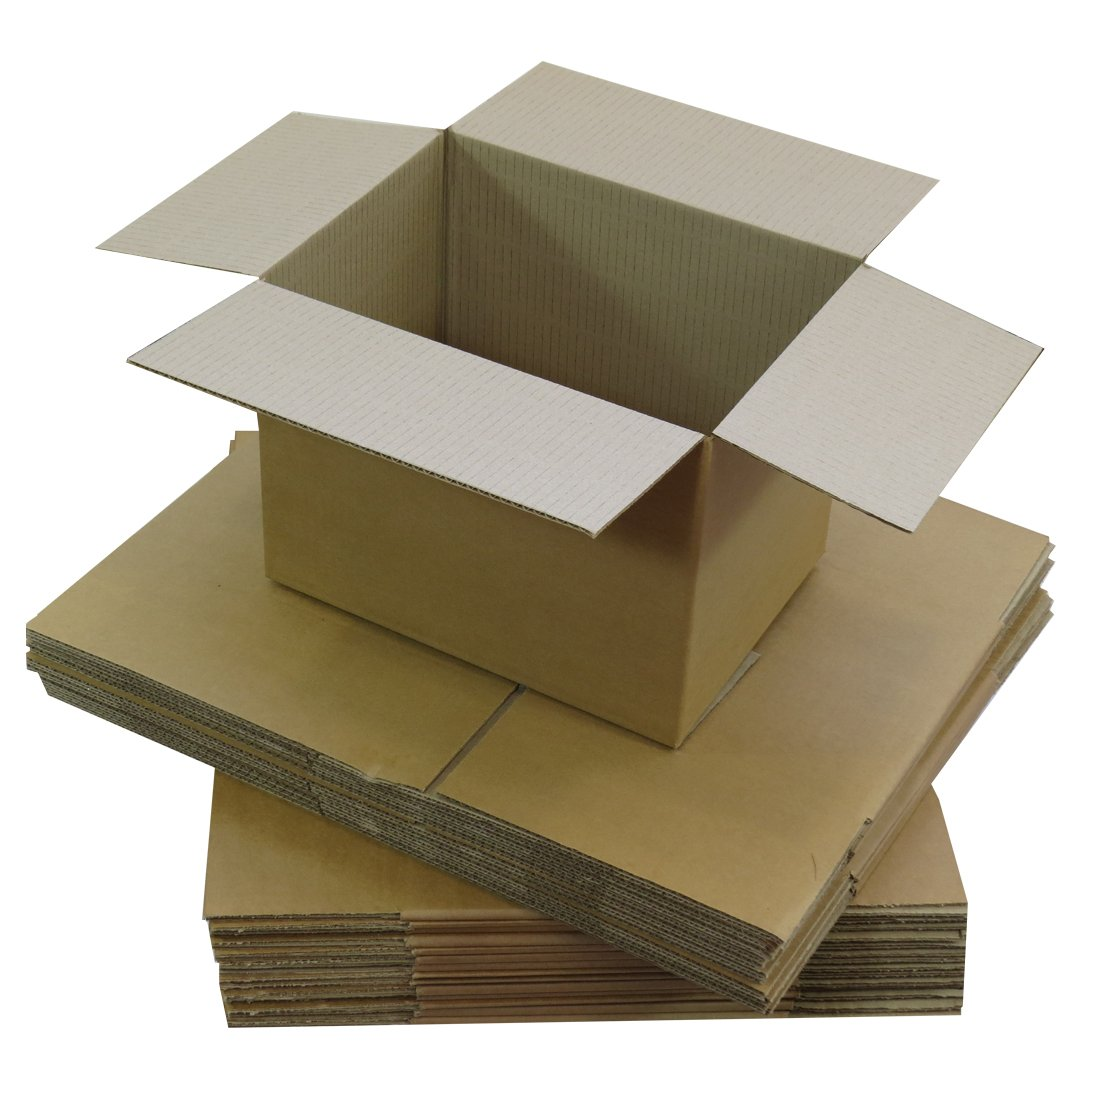 Triplast TPLBX25SINGL - Scatola di cartone a parete singola per spedizioni postali, misura piccola: 203x 152x 102mm TPLBX25SINGL8X6X4